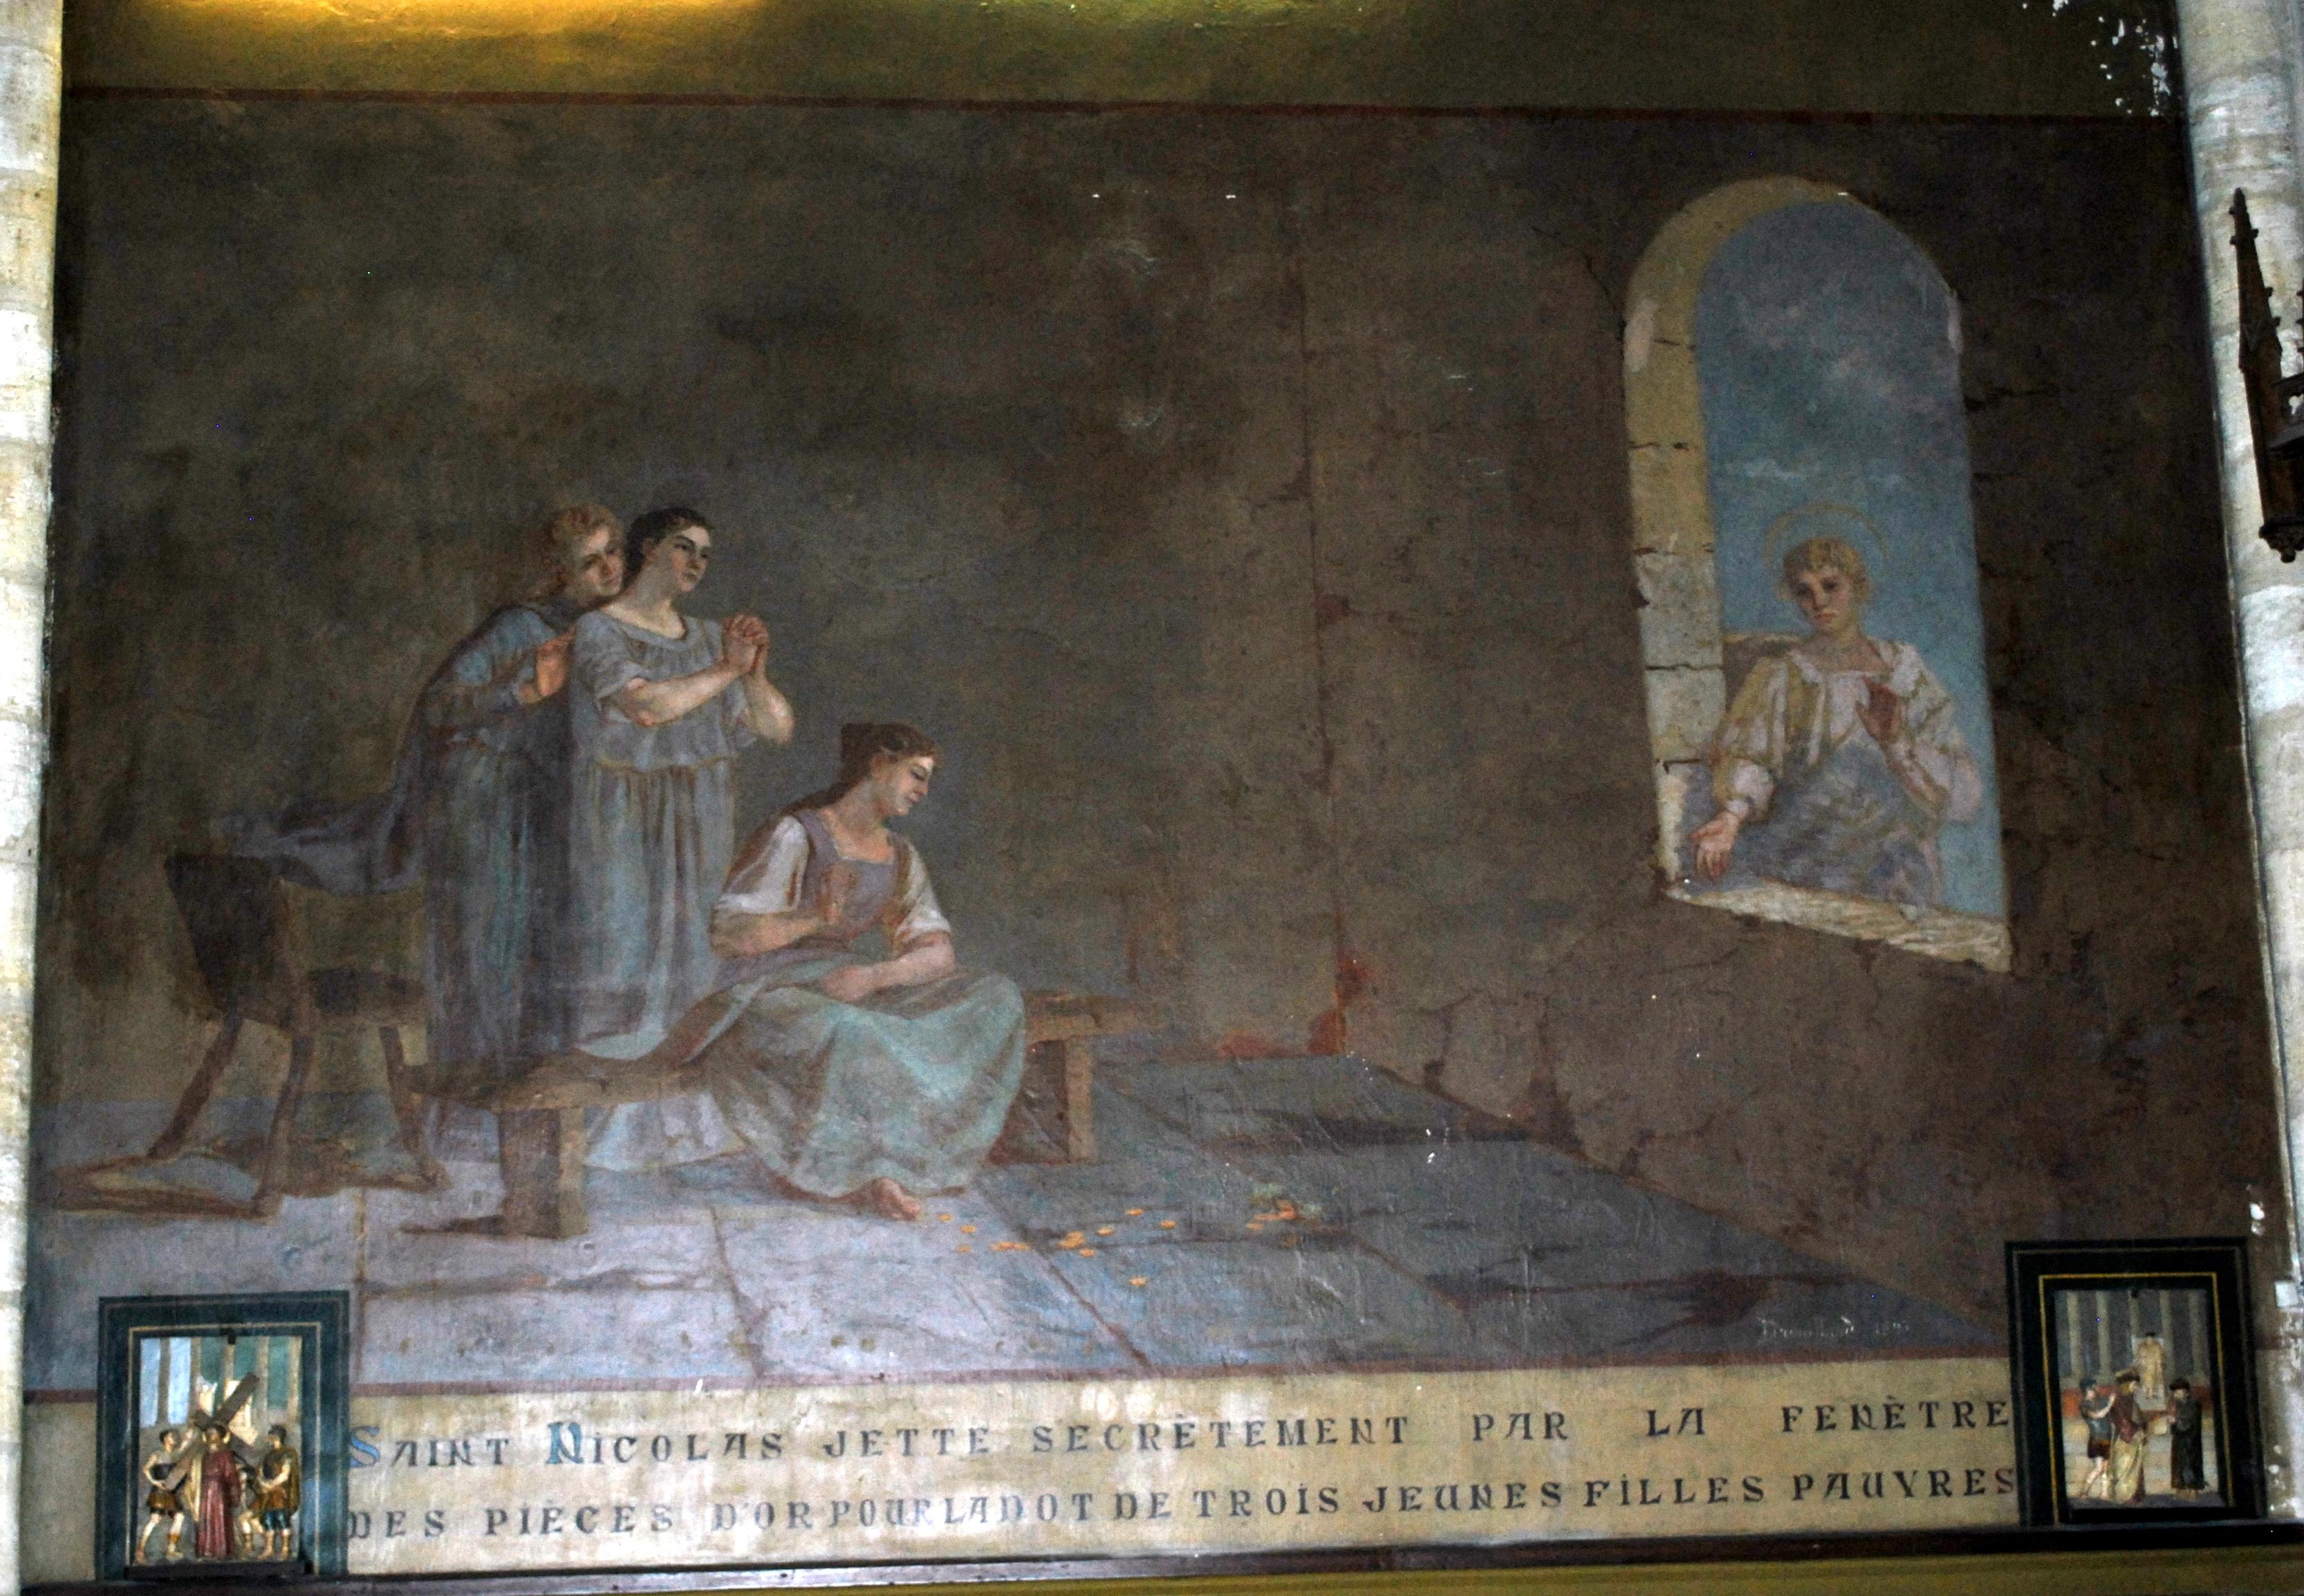 Fichier Capbreton Eglise St Nicolas Peinture Drouillard 1b Jpg Wikipedia